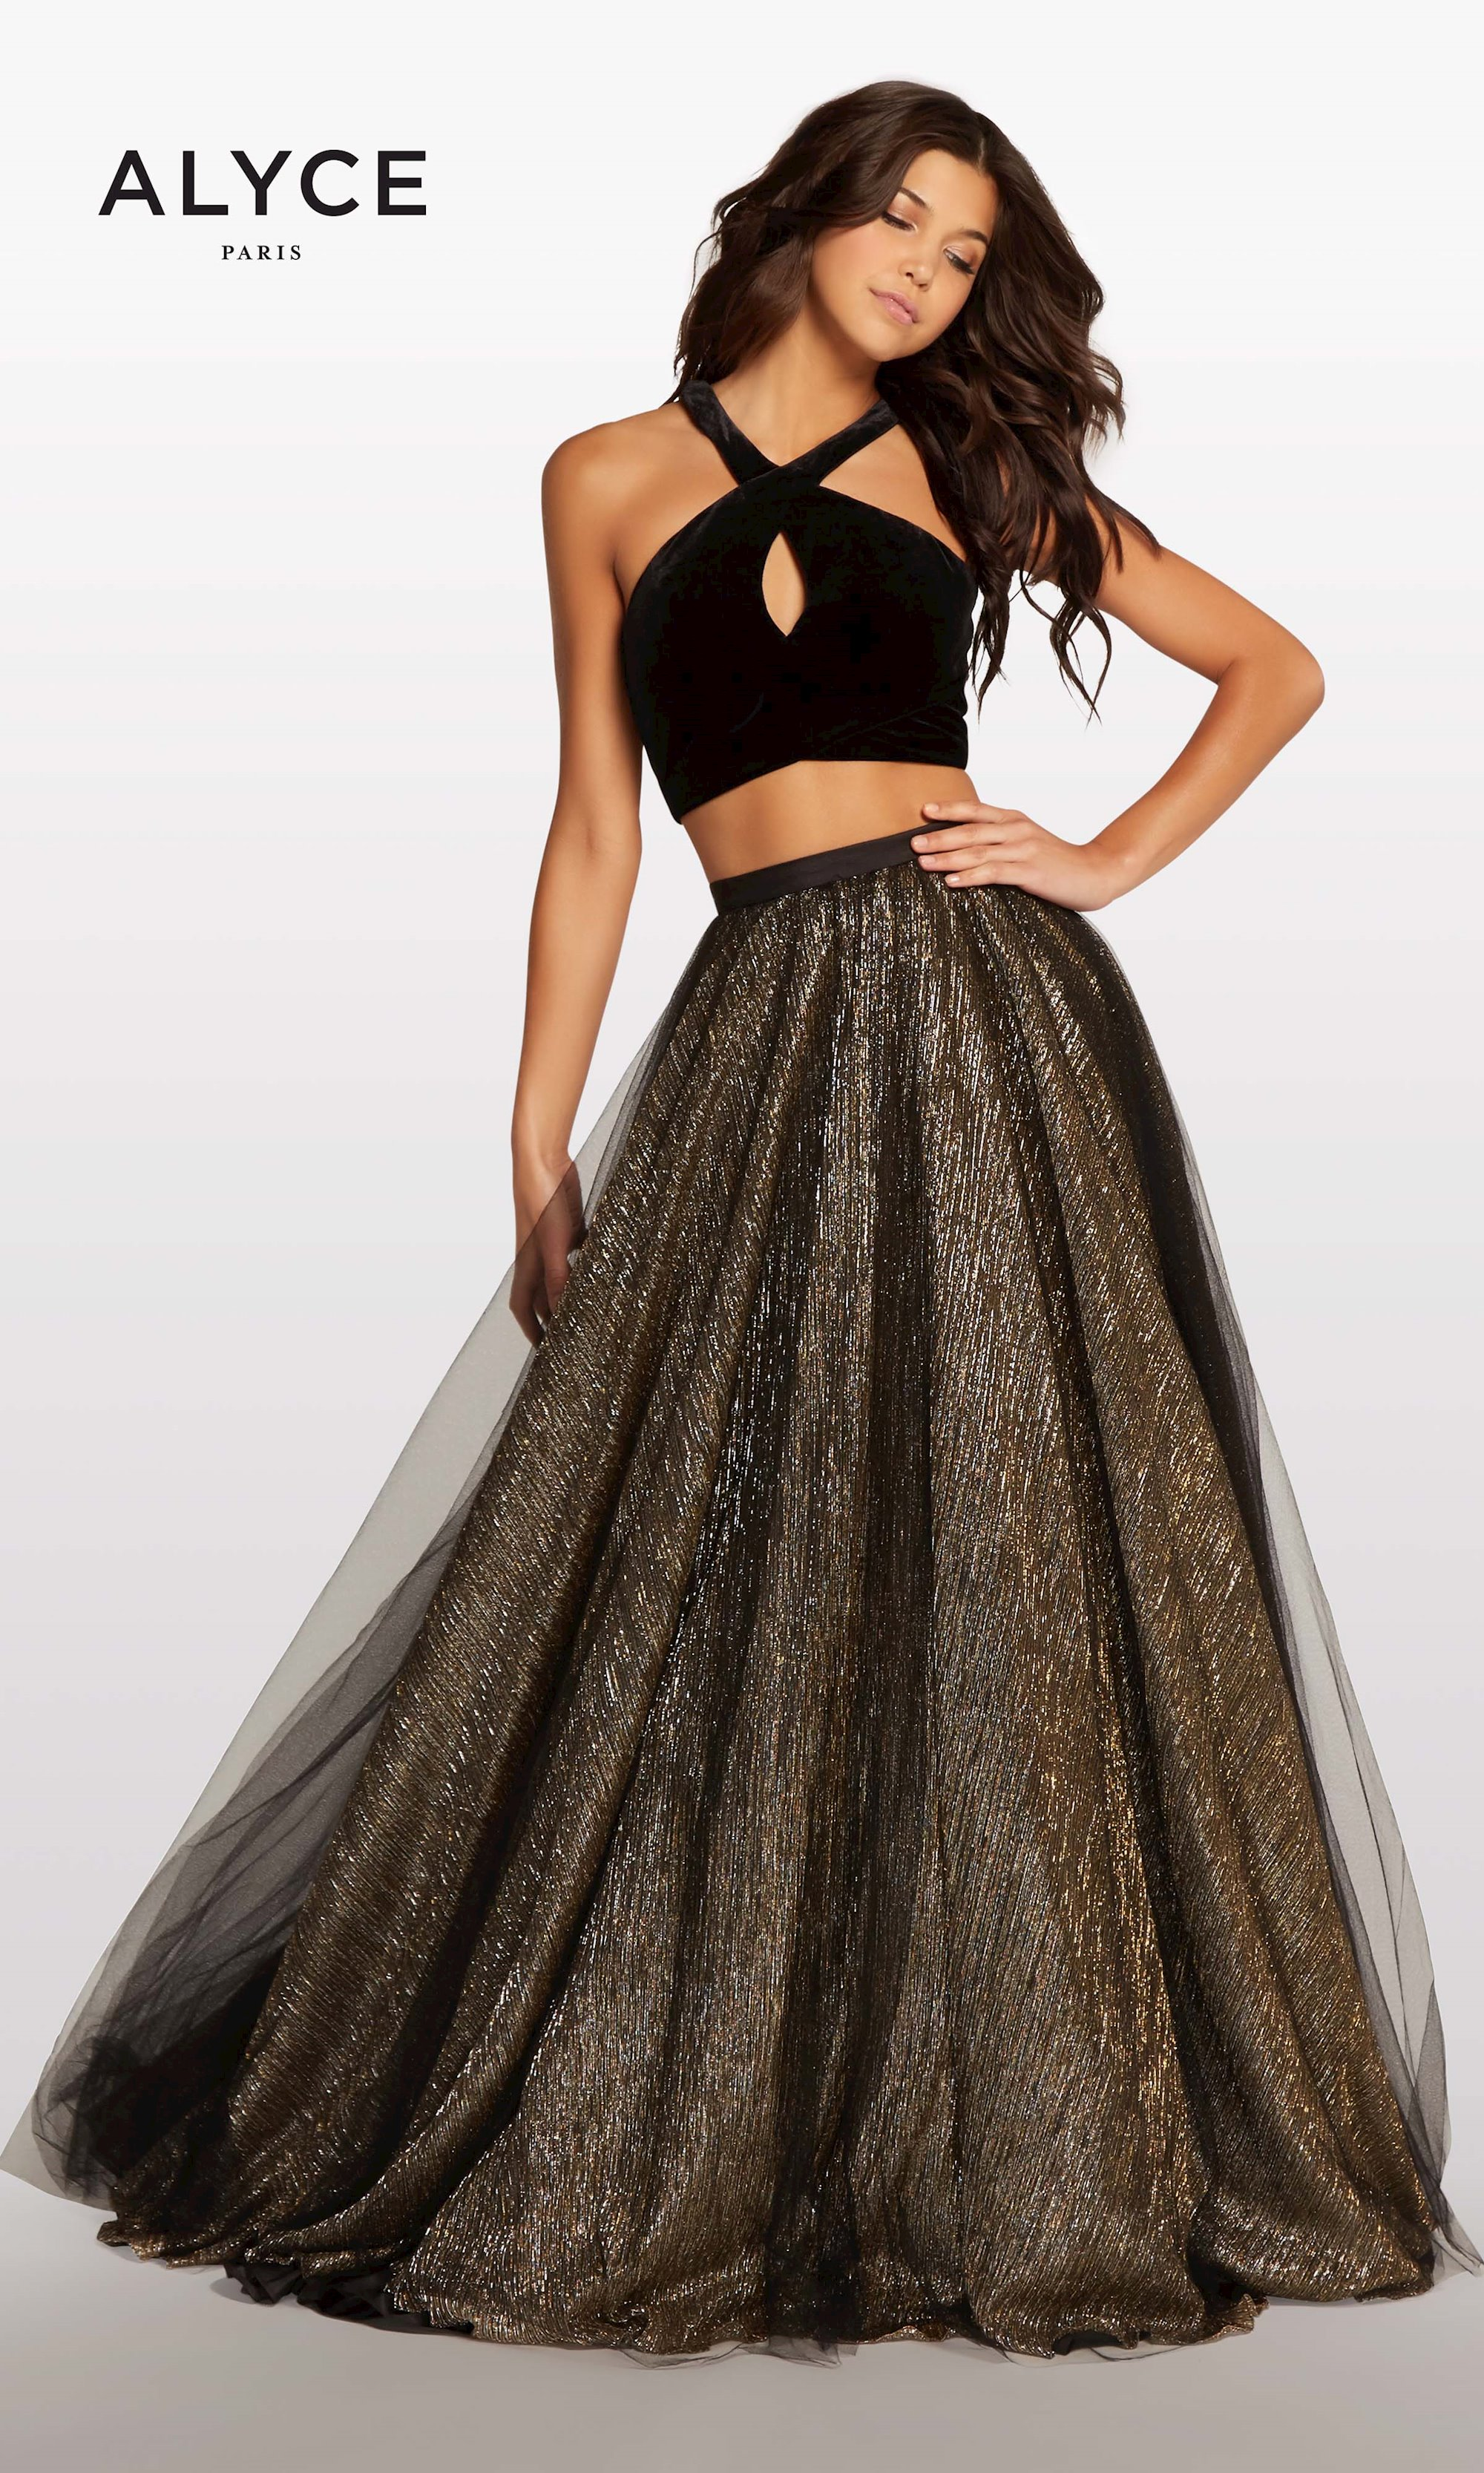 Alyce Paris Kalani Spring 2018 Prom Dresses | Regiss in KY - KP103